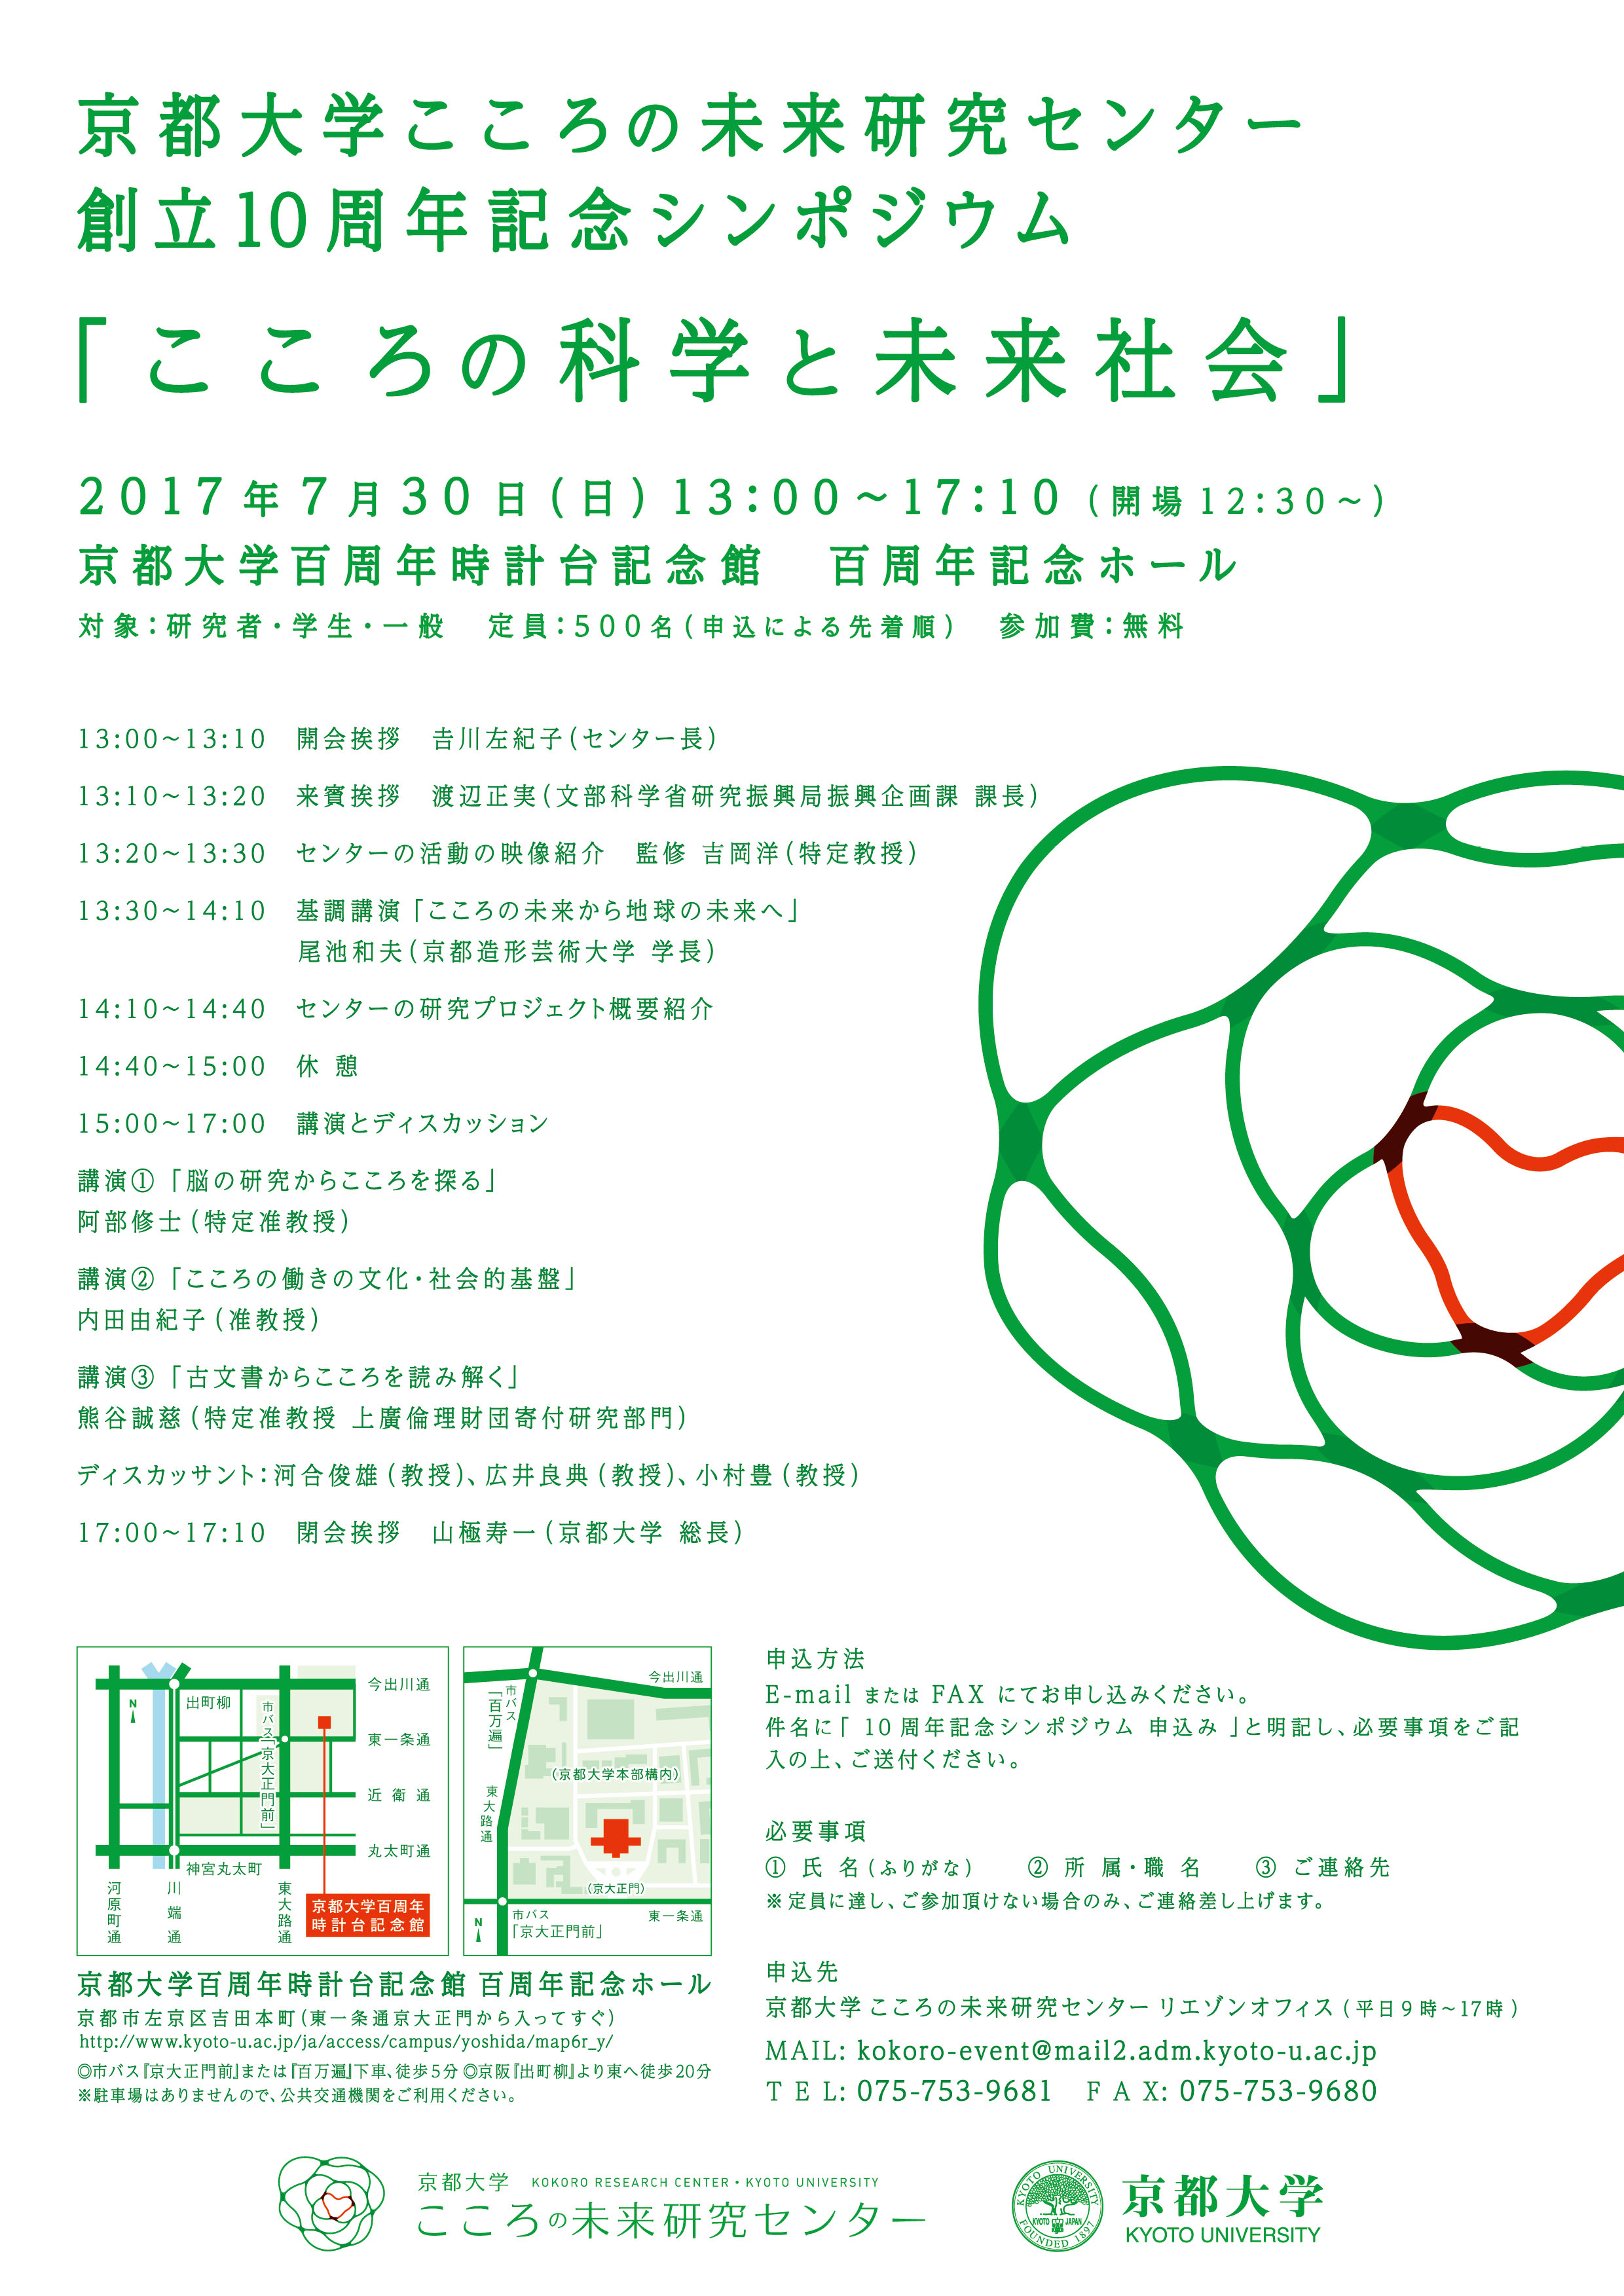 "Kyoto University Kokoro Research Center's 10th Anniversary Symposium ""The Science of Kokoro and the Future of Society"""